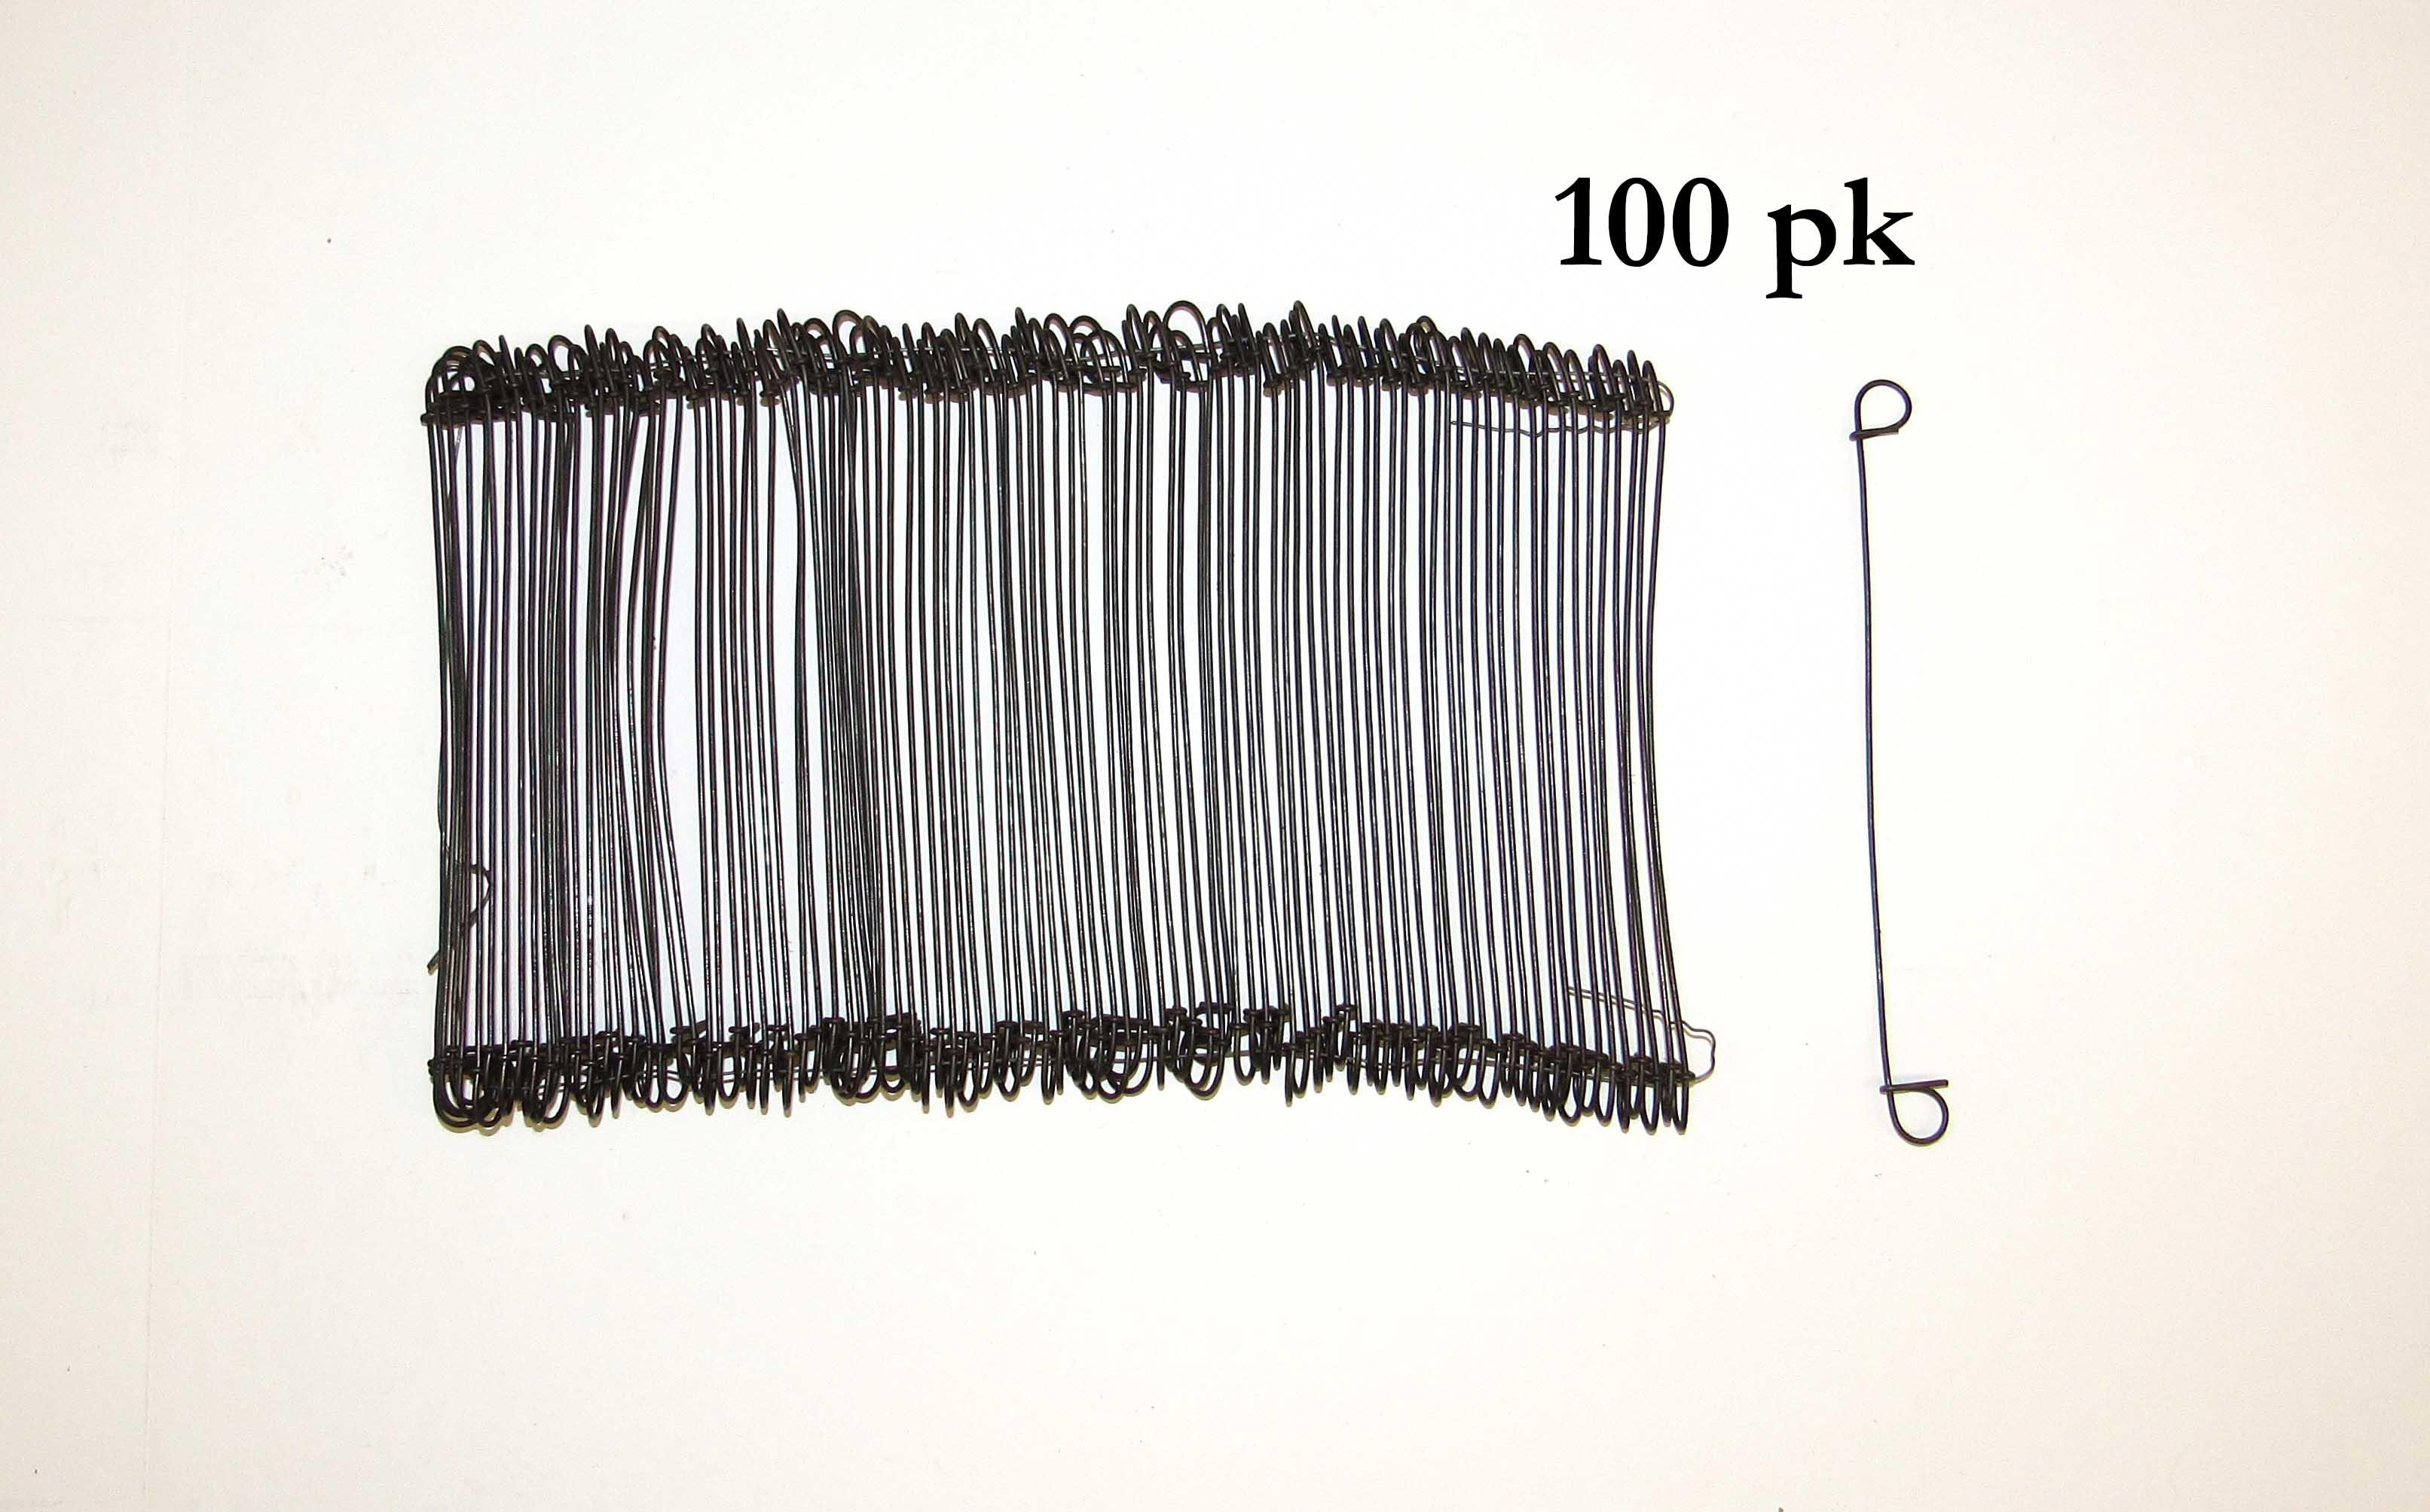 Funky Rebar Tie Wire Crest - Wiring Diagram Ideas - guapodugh.com